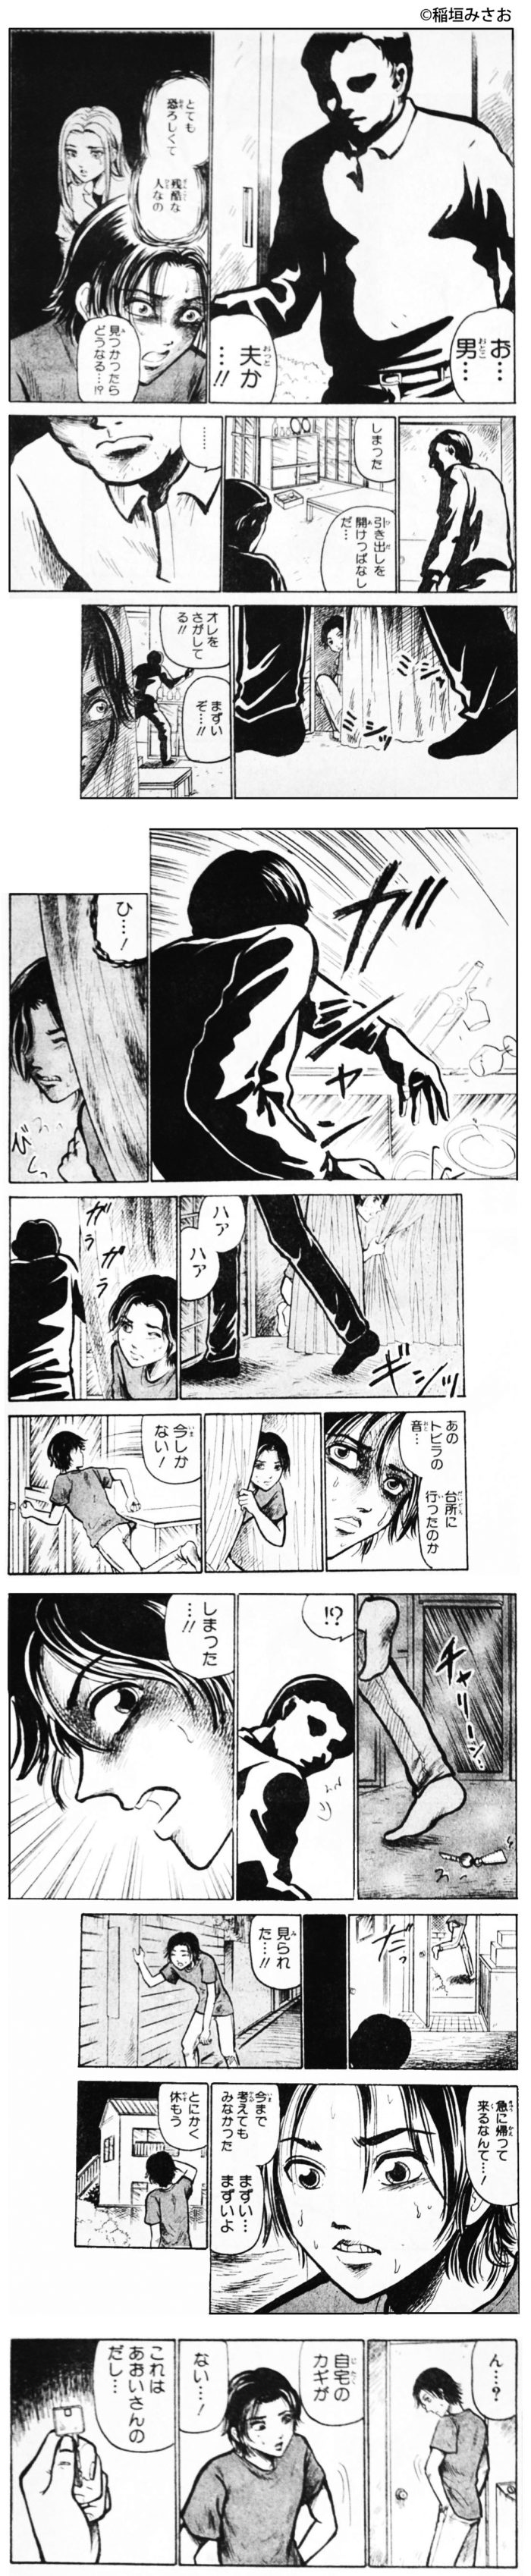 koufukuno-kagi2-01